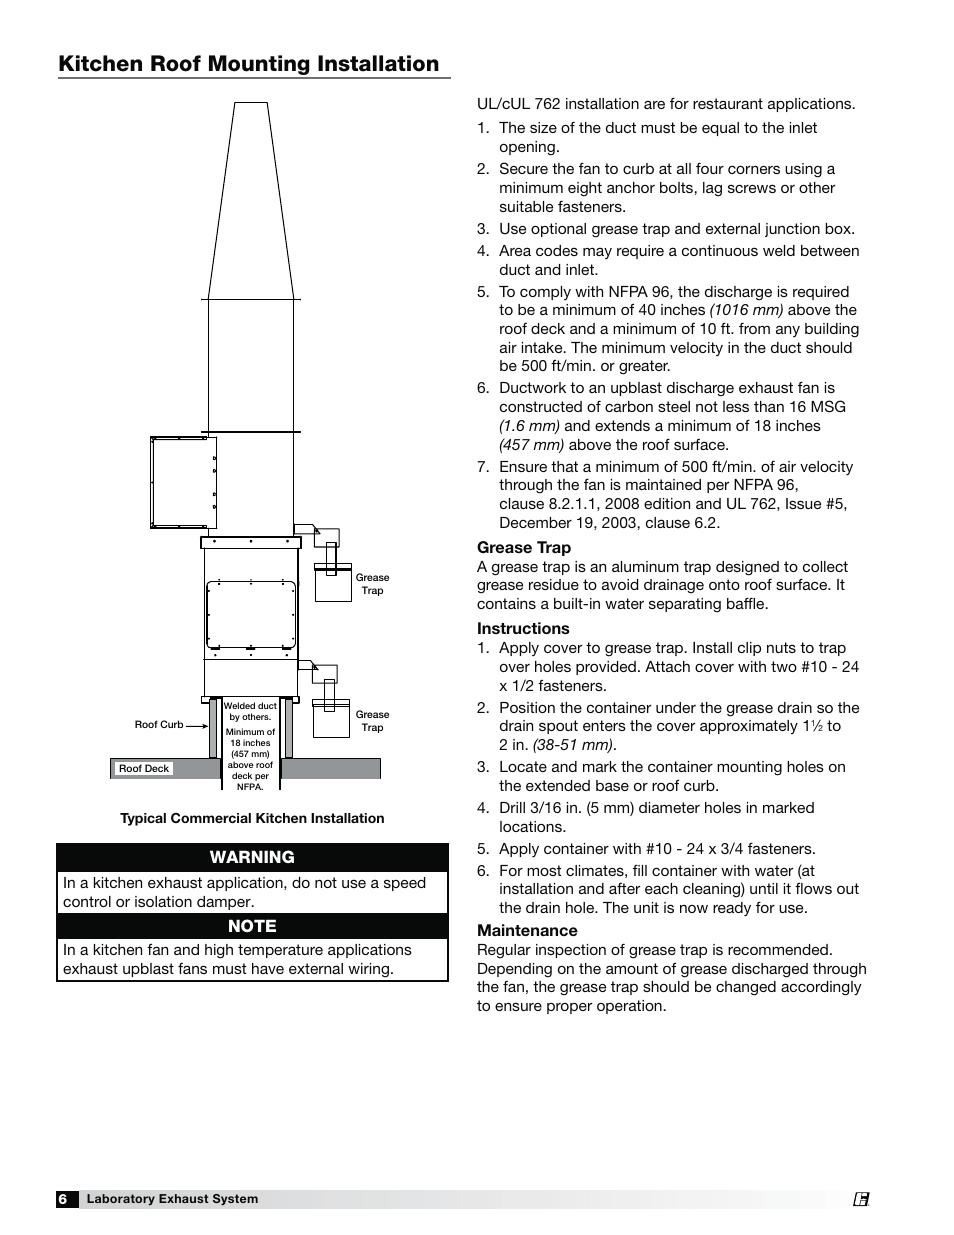 medium resolution of laboratory exhaust fan wiring diagram wiring diagramskitchen roof mounting installation warning greenheck fan laboratory exhaust